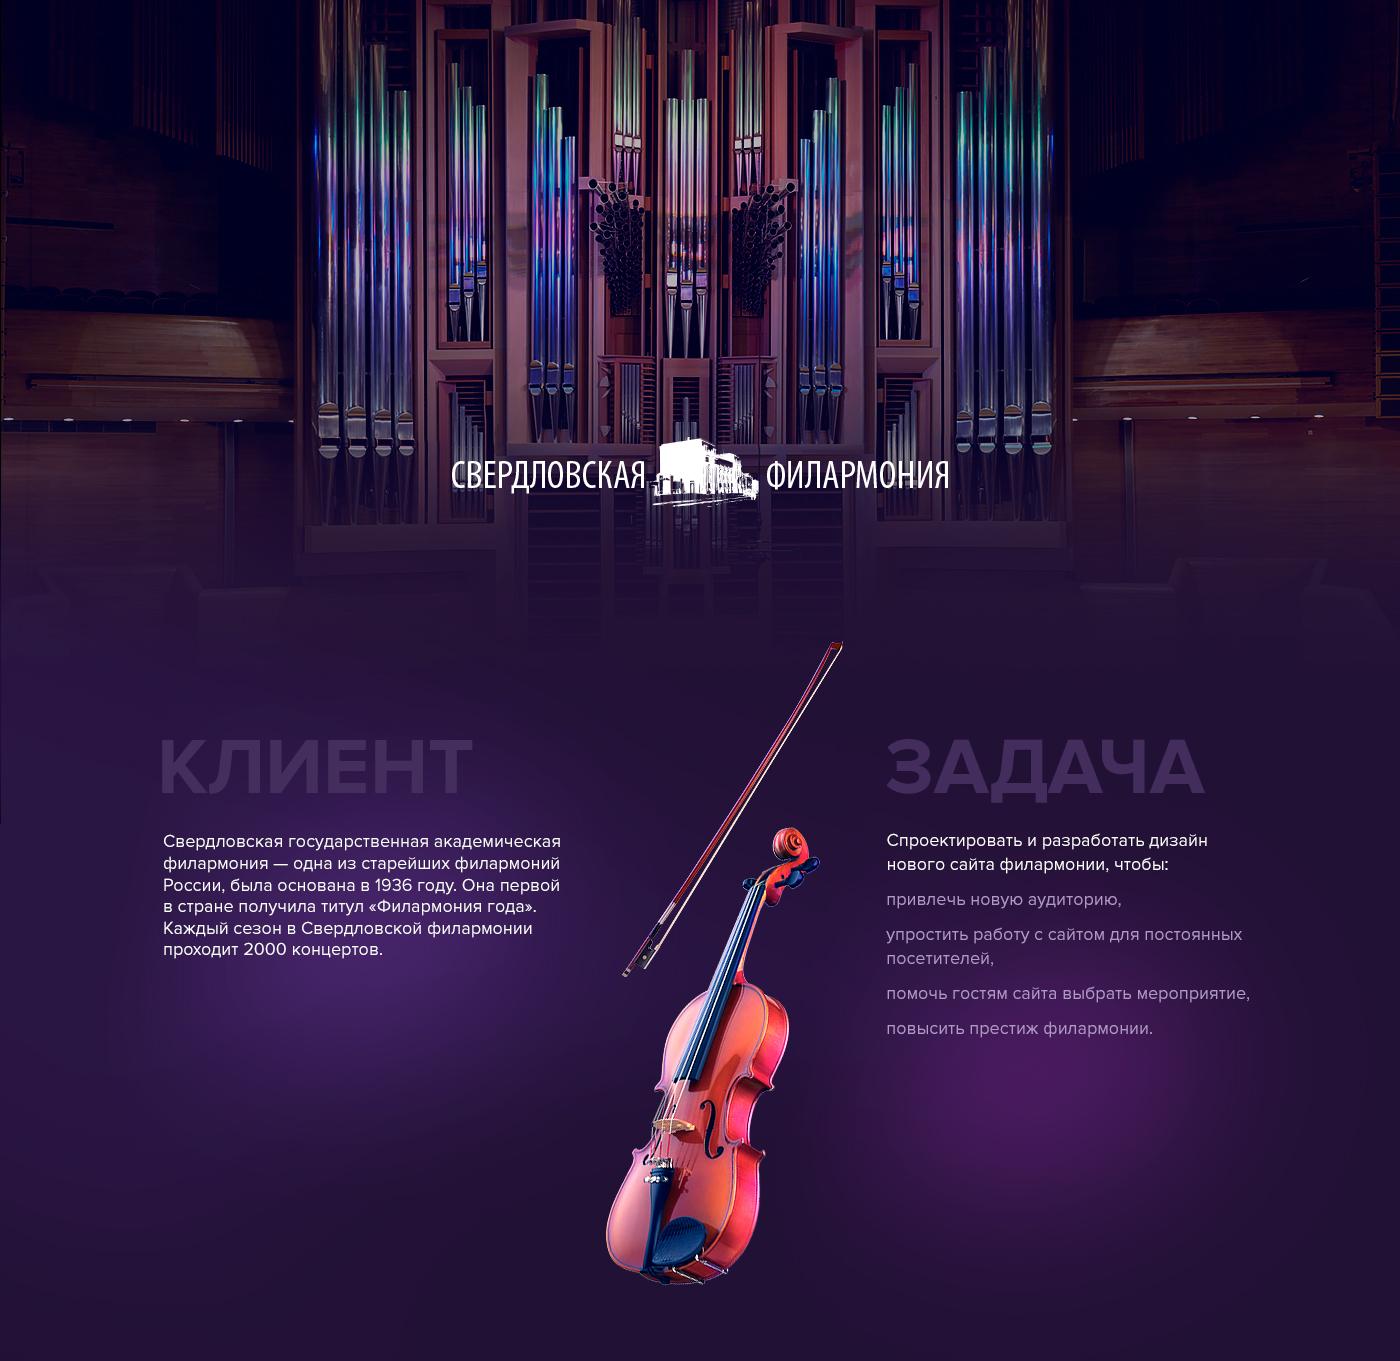 jetstyle,philharmonic,music,UI,ux,culture,Classical